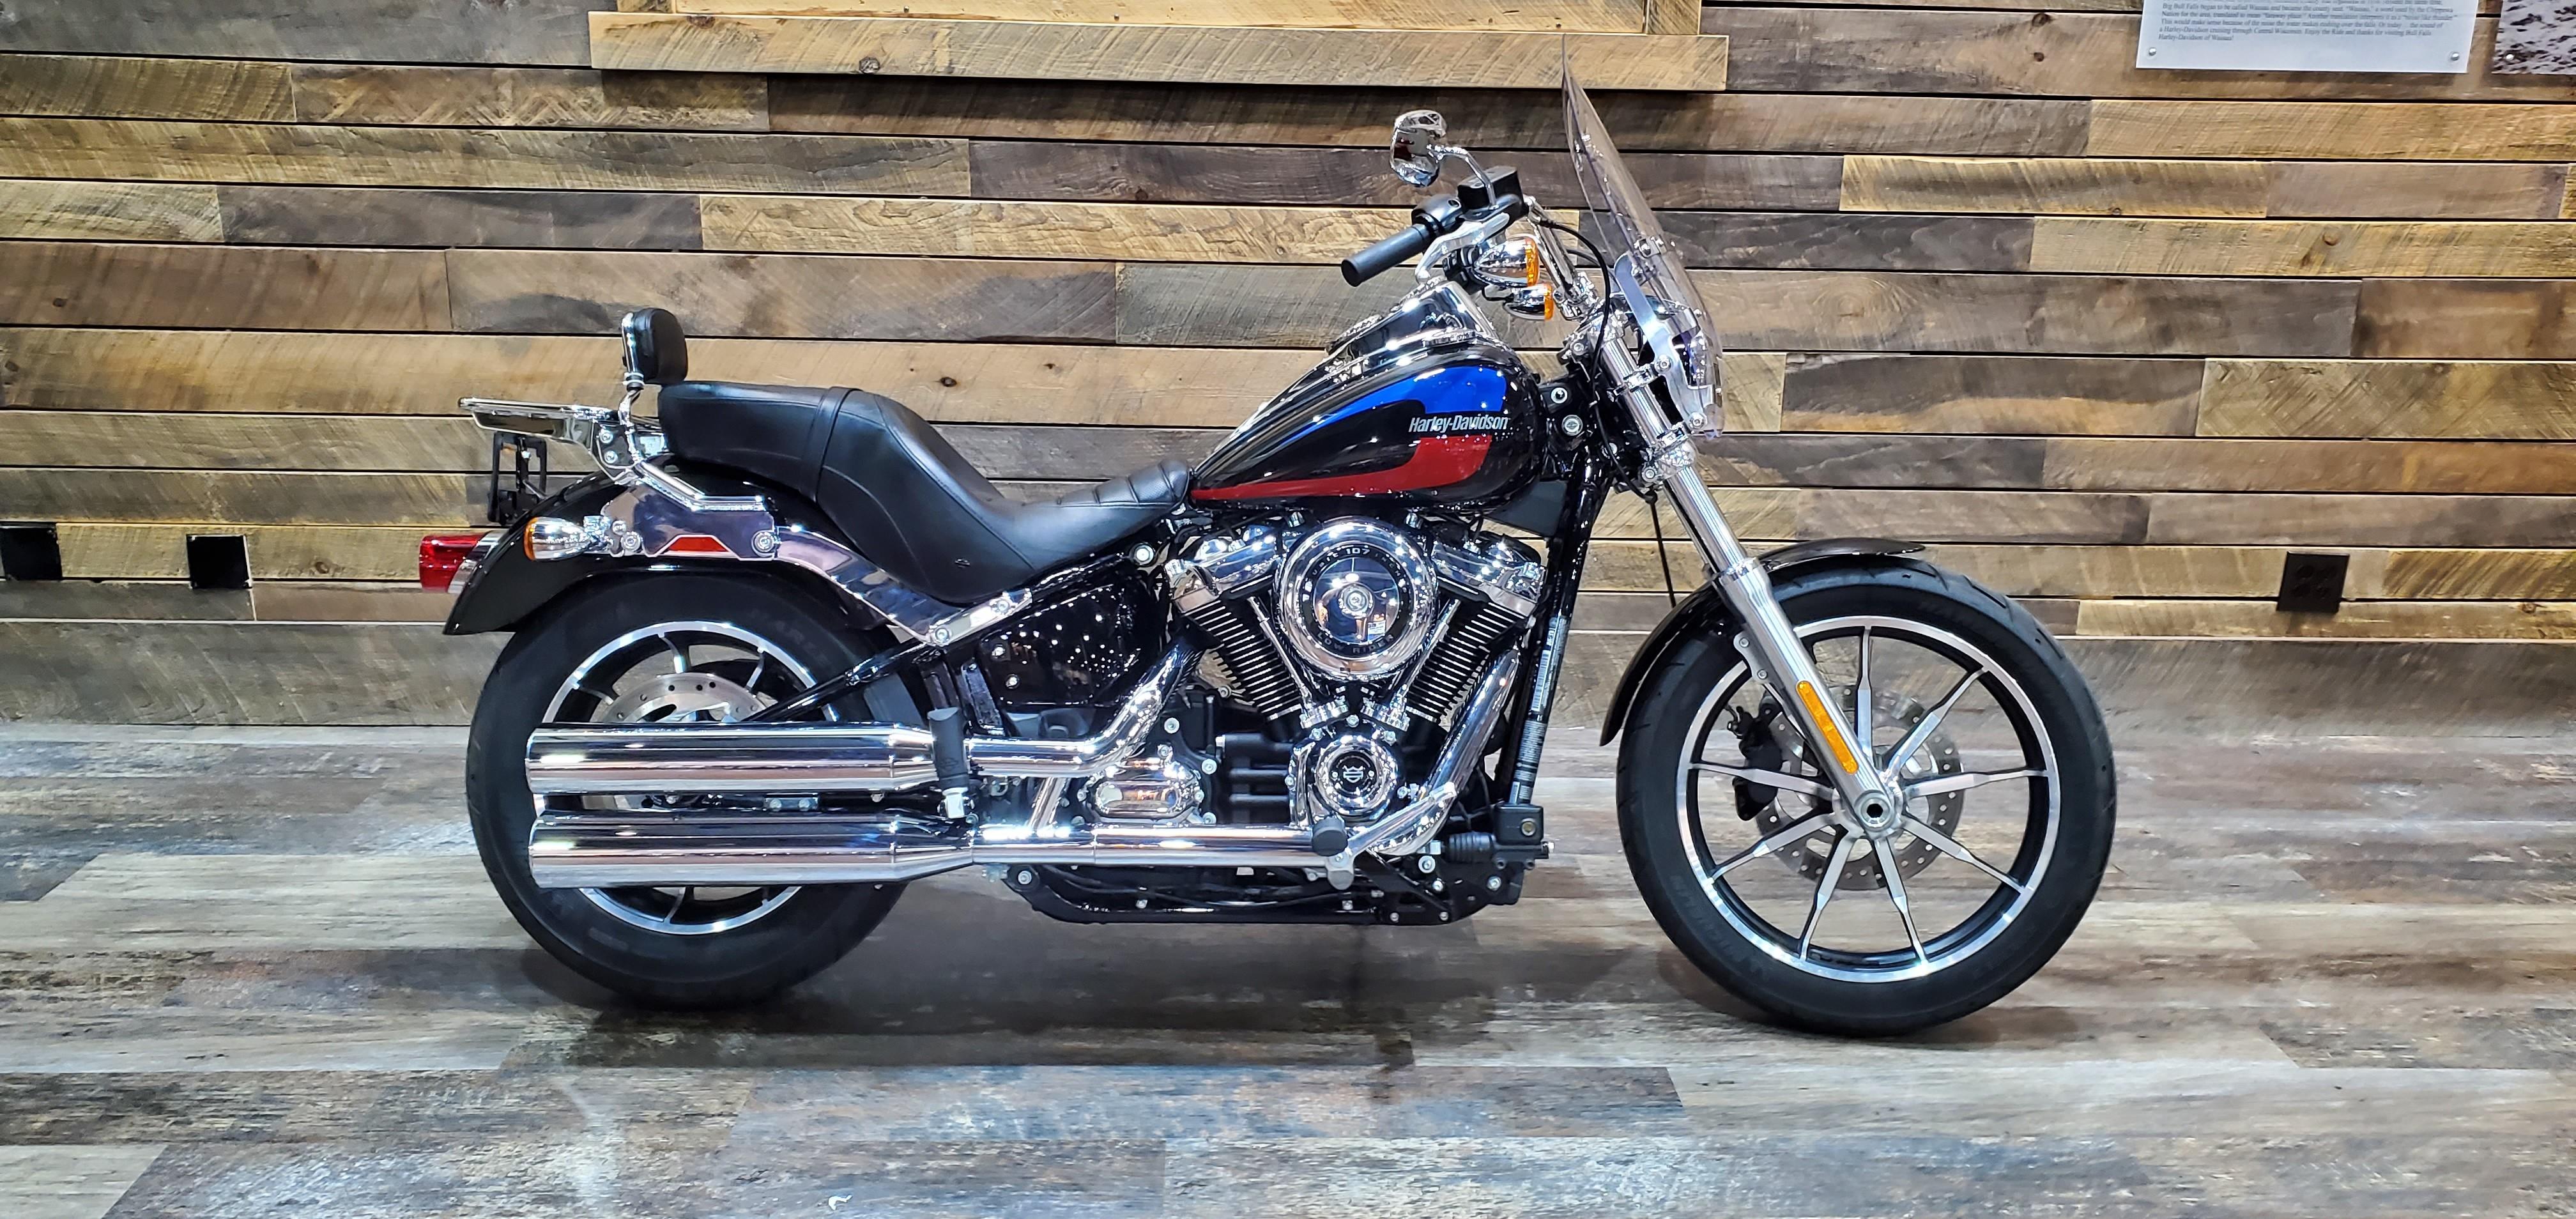 2018 Harley-Davidson Softail Low Rider at Bull Falls Harley-Davidson